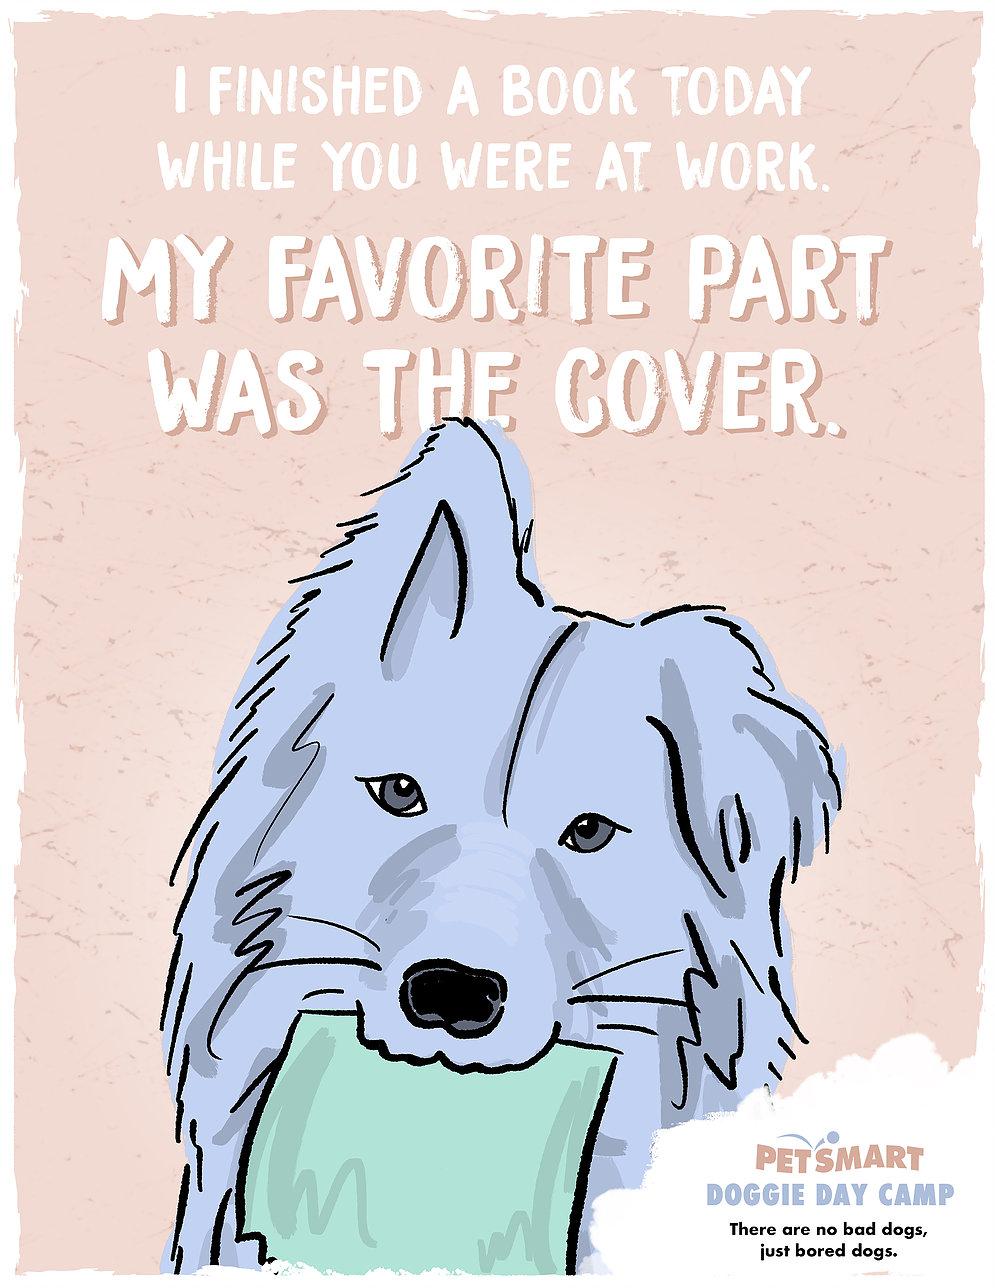 petsmart-doggie-day-camp-book.jpg